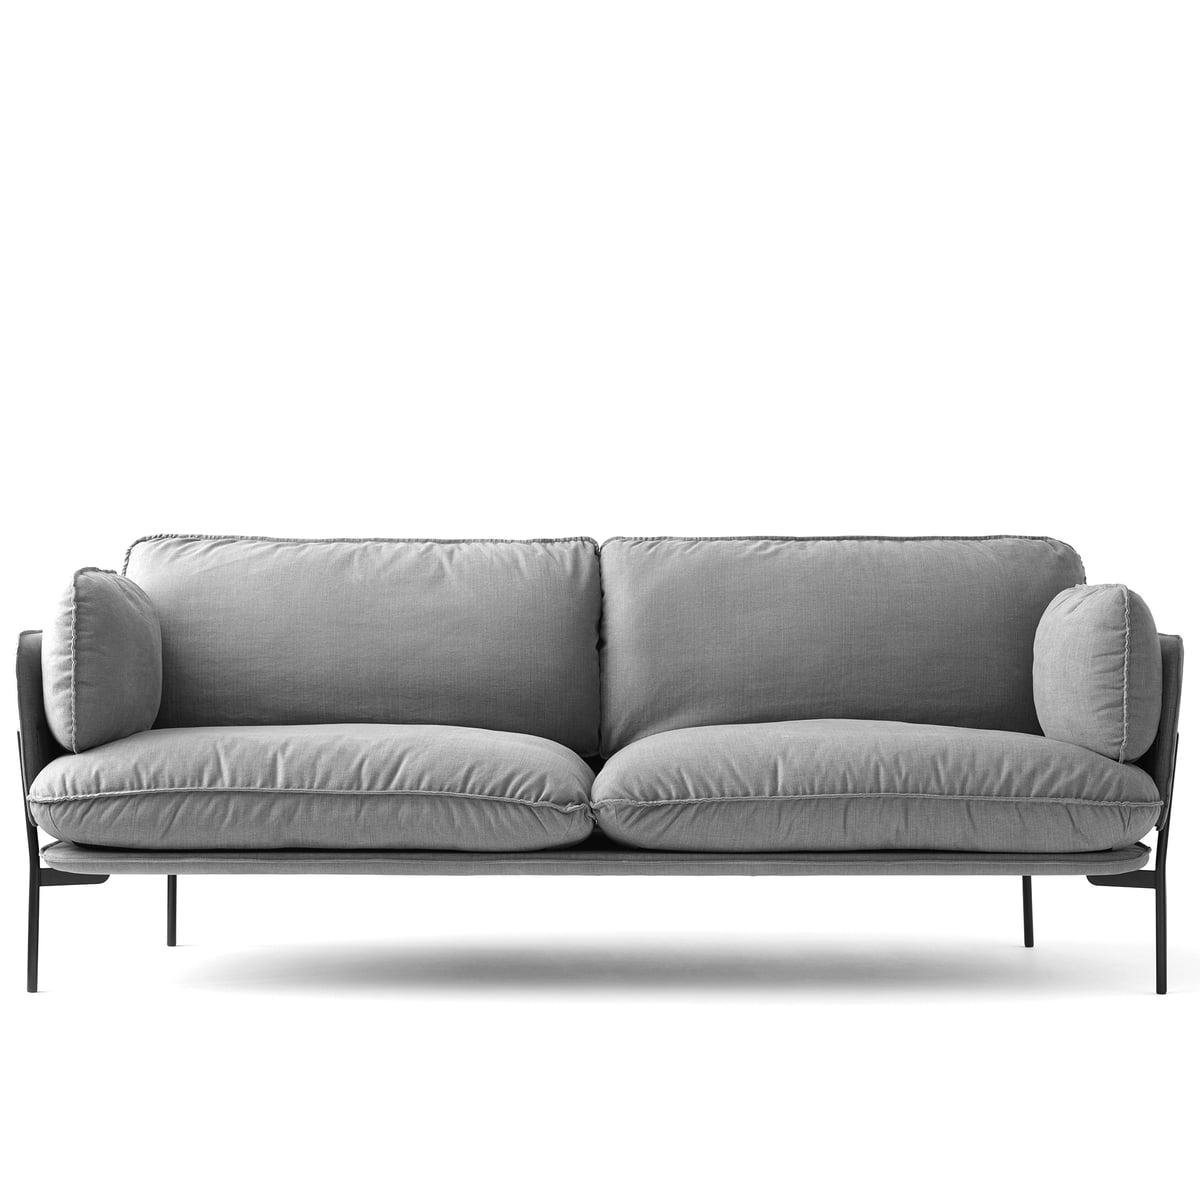 Andtradition cloud sofa ln 3 2 untergestell warm black hot madison 724 einzel